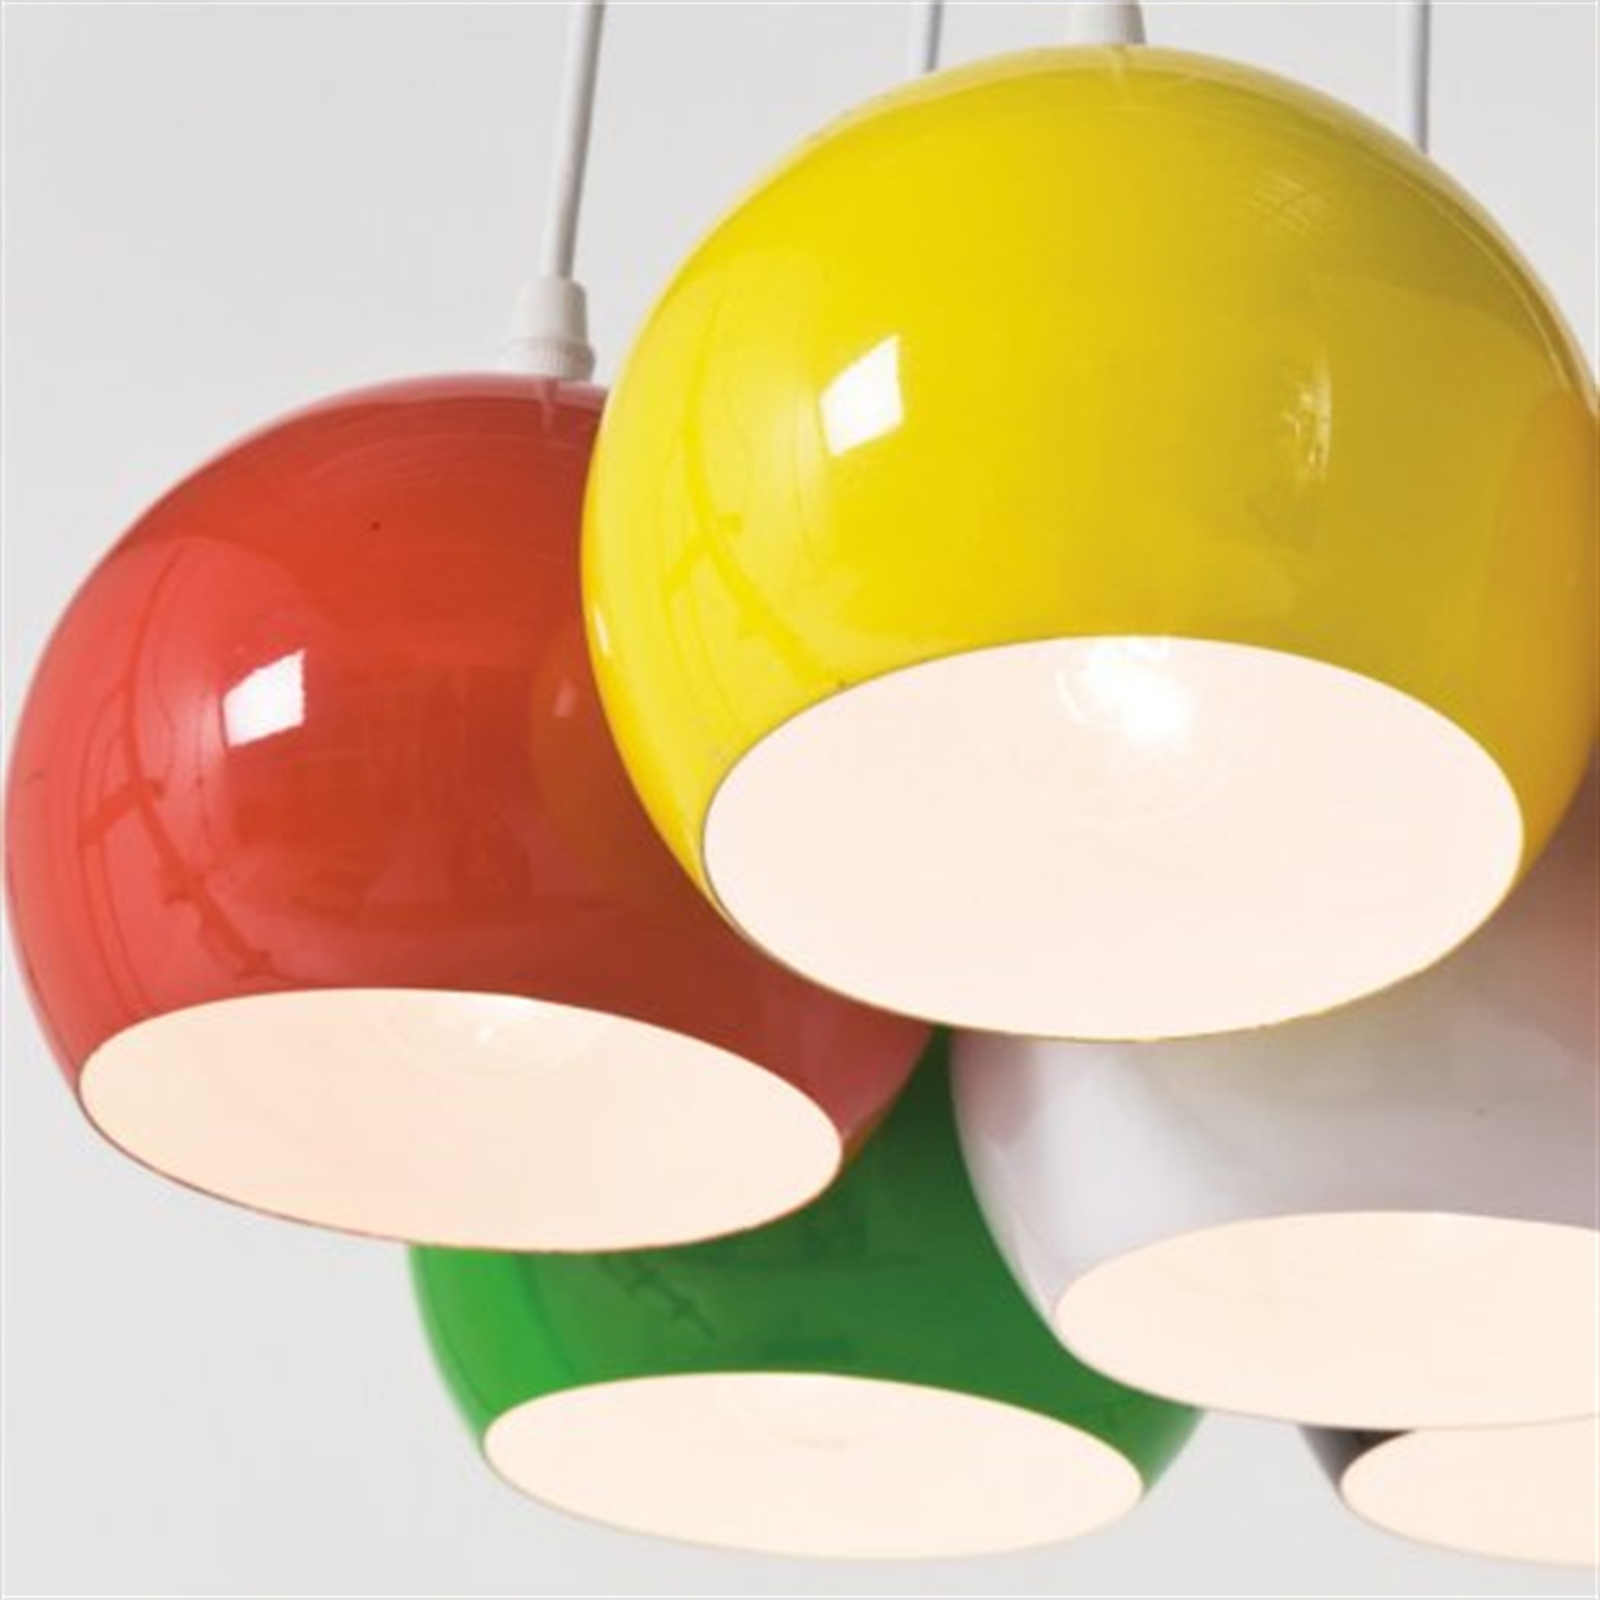 Design h ngeleuchte 7 kugeln lampe calotta bunt h ngelampe for Design hangeleuchte